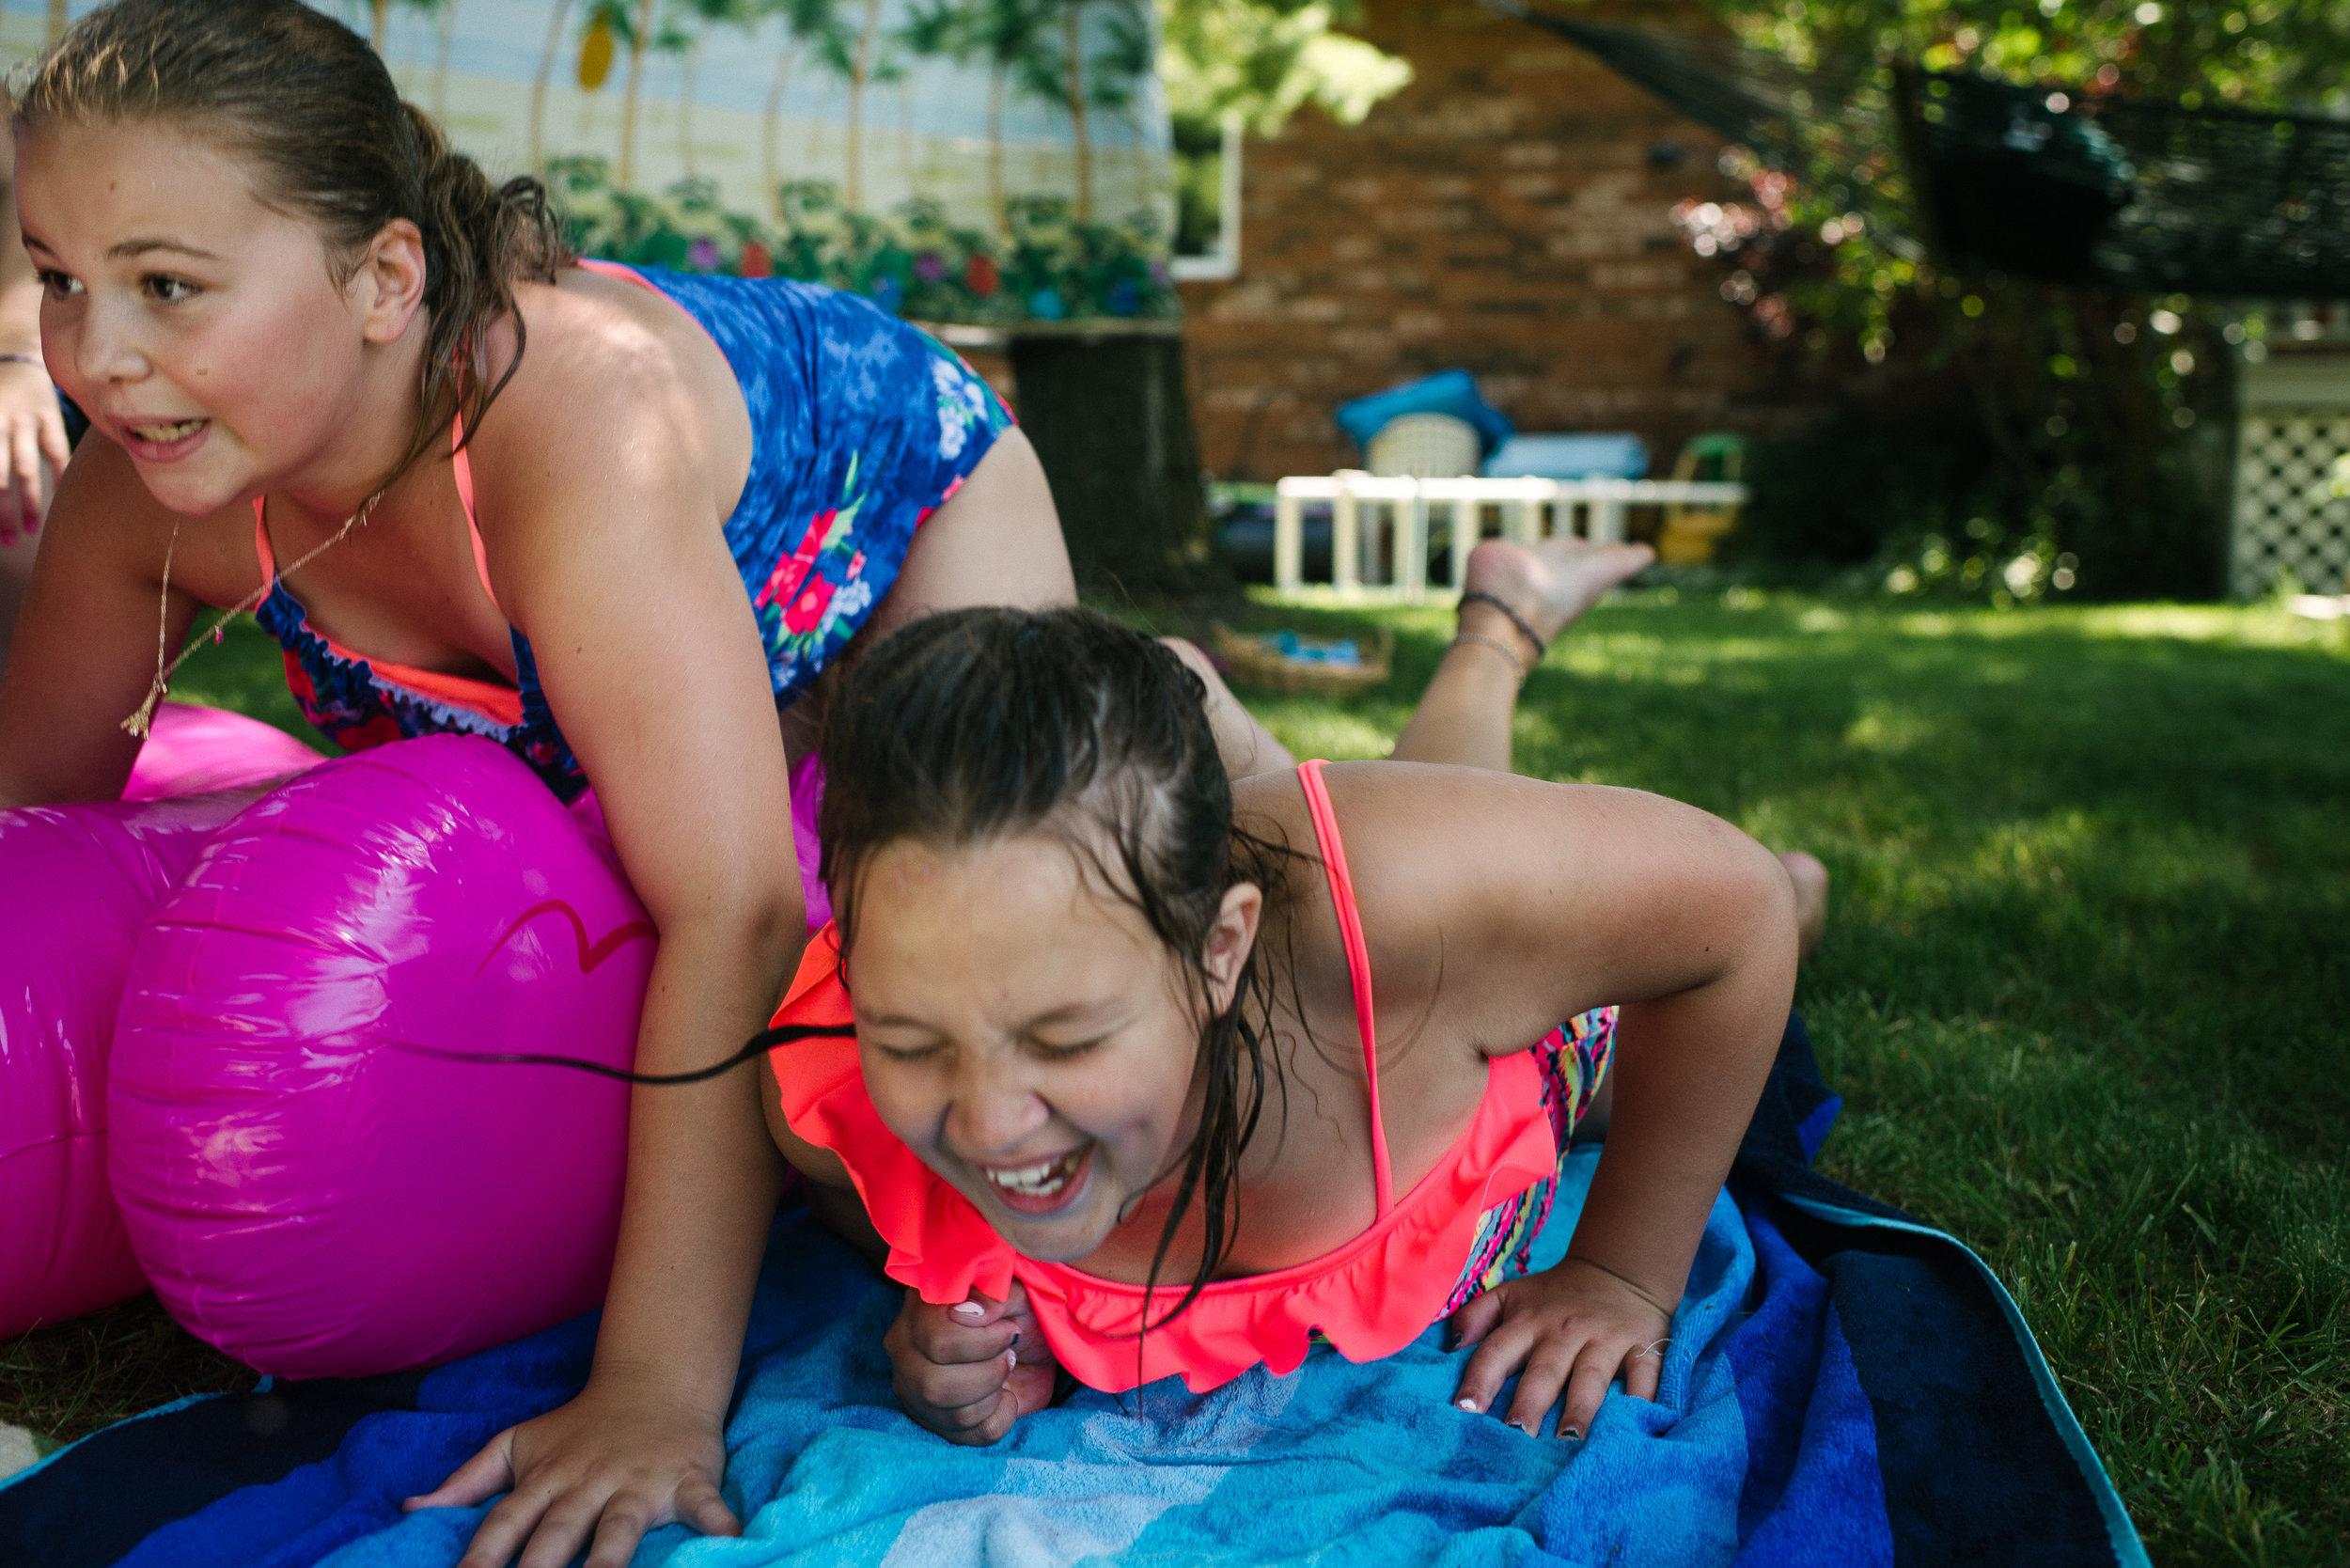 girl birthday party photography kingston-144743vm.jpg